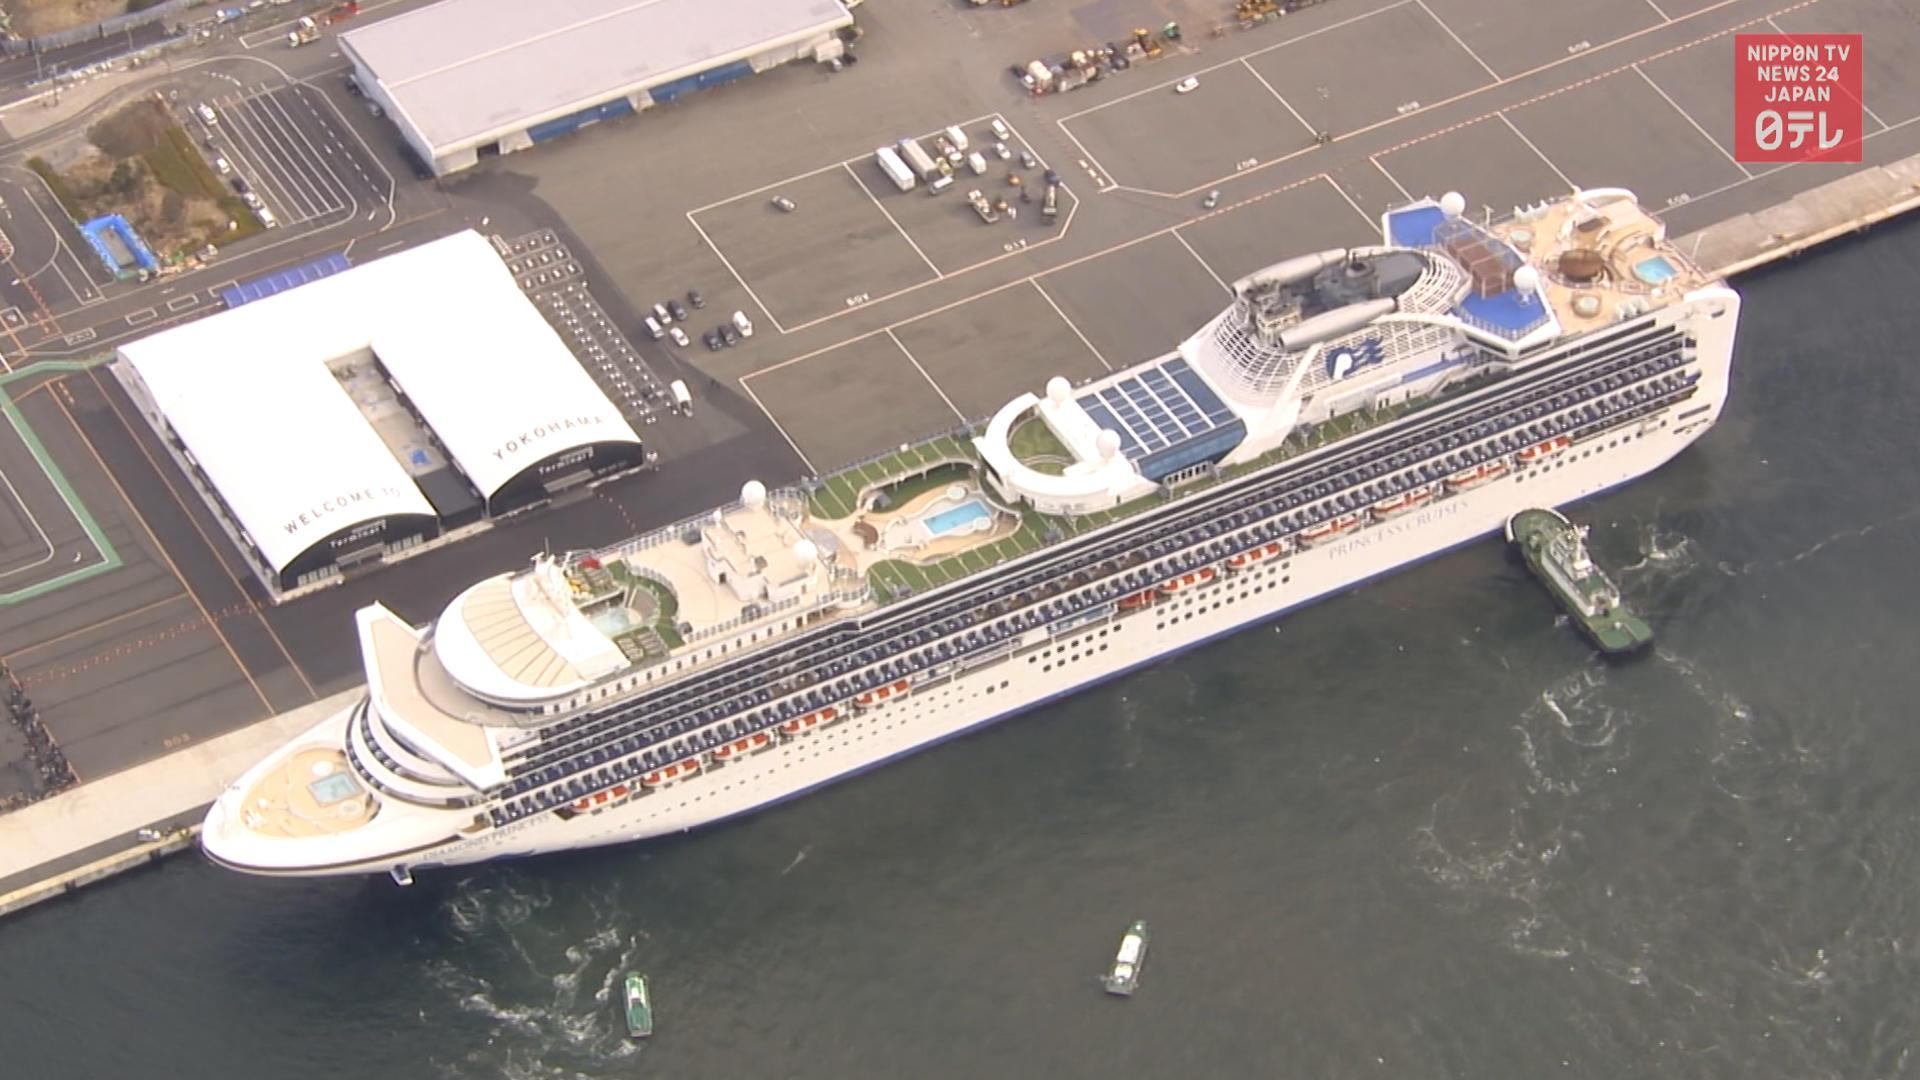 CORONAVIRUS: Inside Japan's quarantined cruise ship